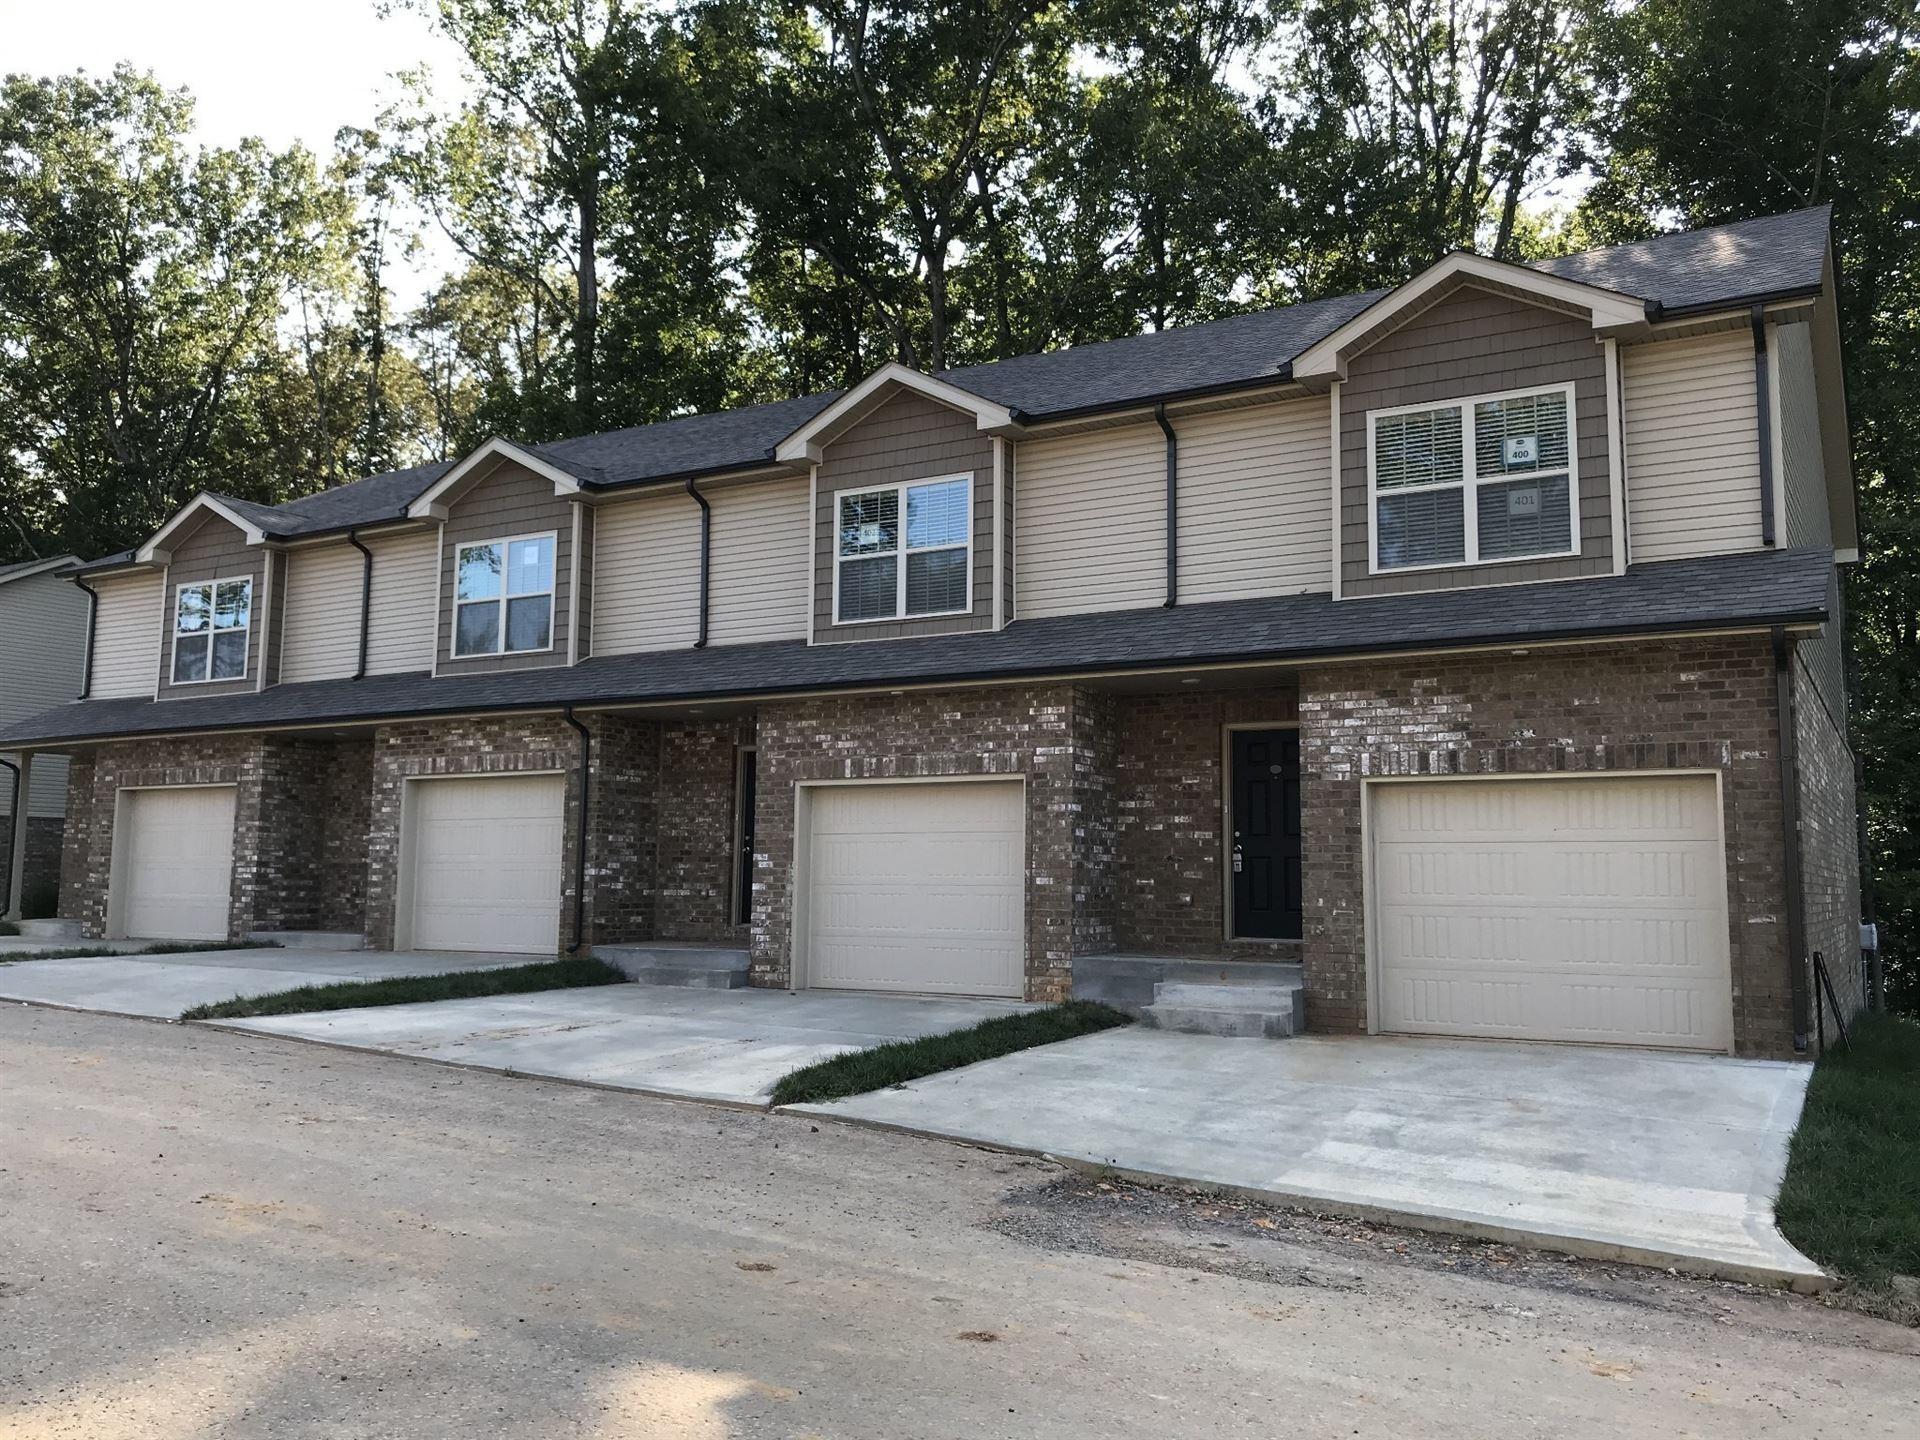 135 Country Lane Unit 602, Clarksville, TN 37043 - MLS#: 2177040